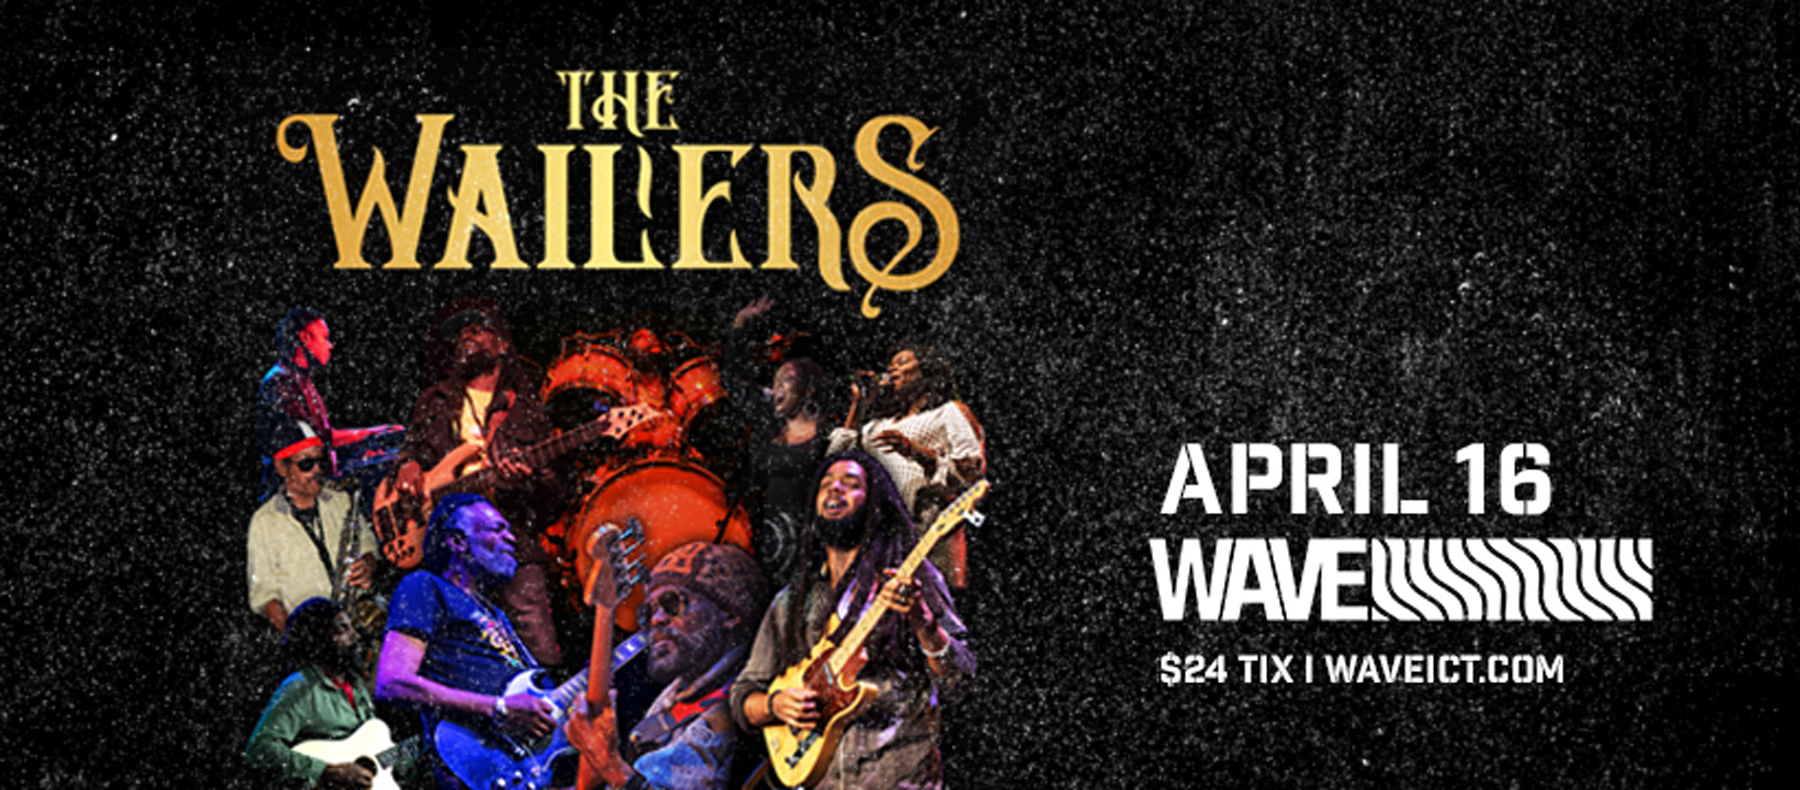 WAILERS-FB.jpg